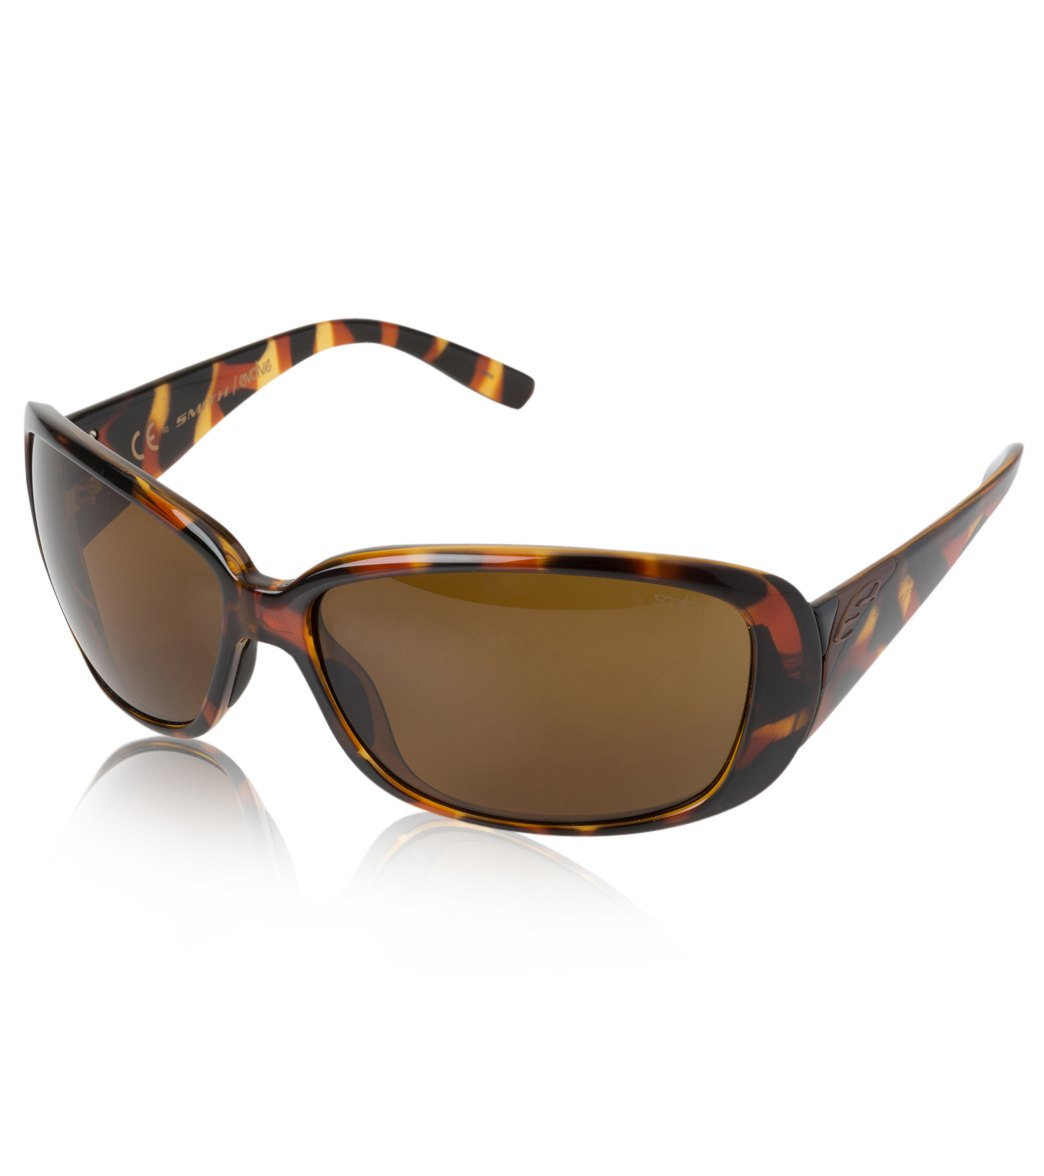 5245a7fce4a45 Smith Optics Women s Shorewood Sunglasses at SwimOutlet.com - Free Shipping